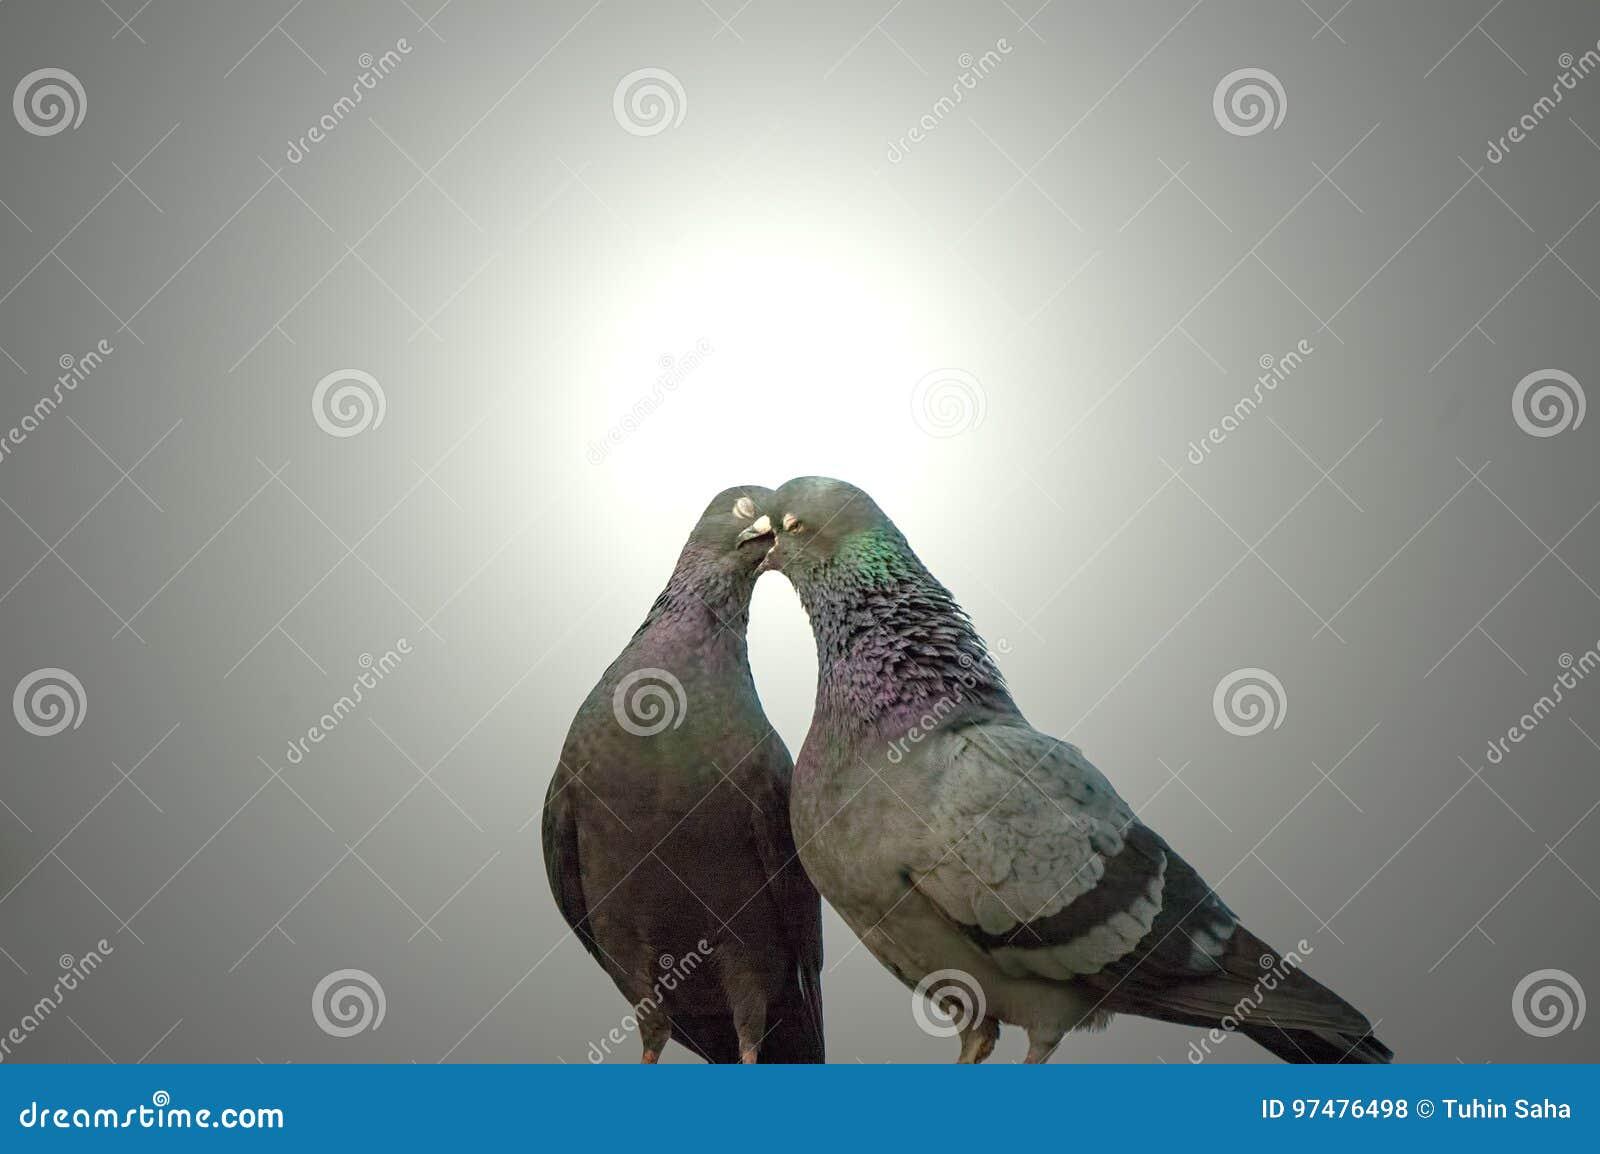 Como hacen el amor las palomas [PUNIQRANDLINE-(au-dating-names.txt) 40